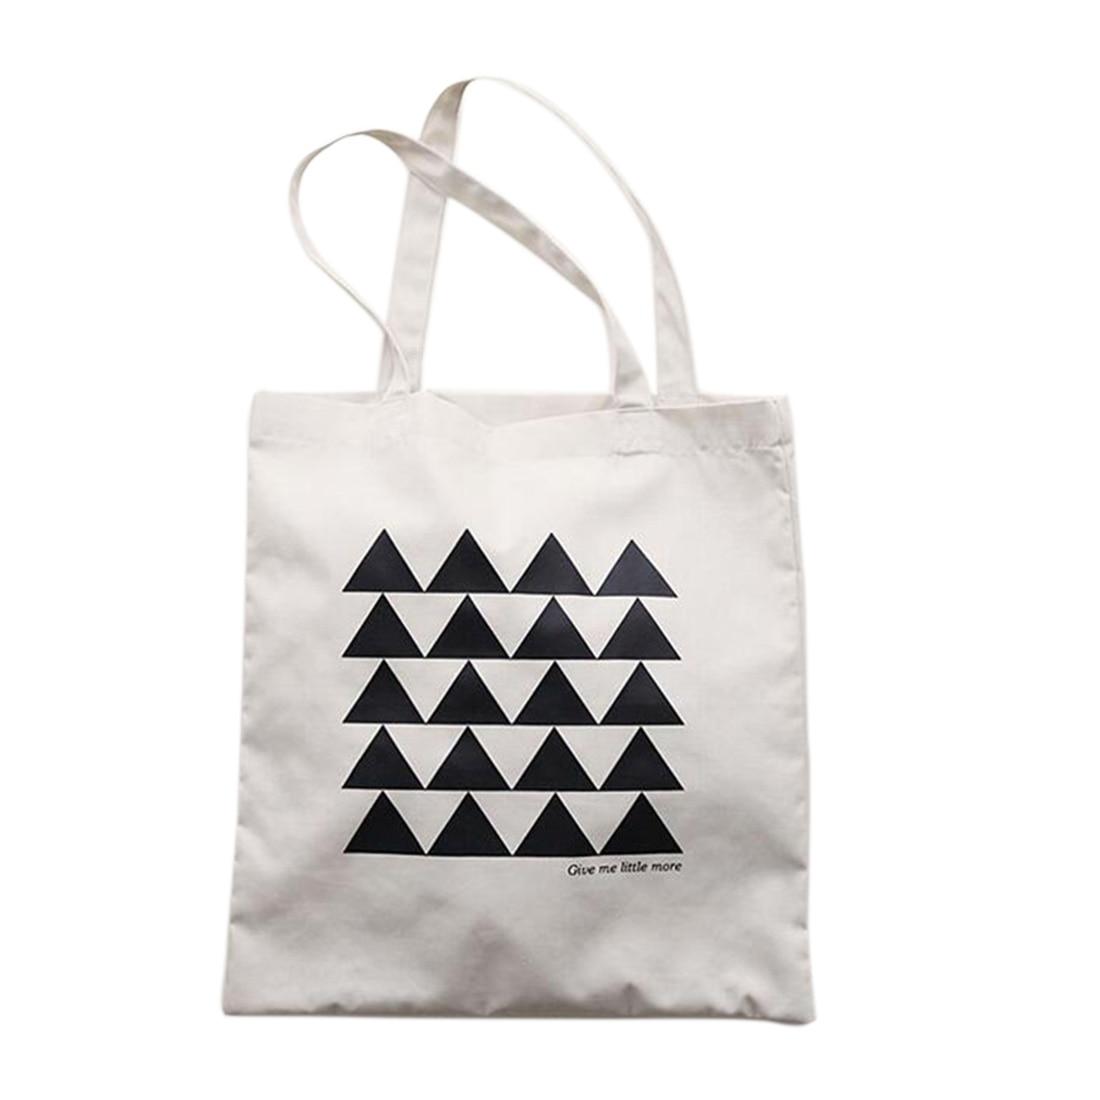 Online Get Cheap Shopping Bags Sale -Aliexpress.com | Alibaba Group